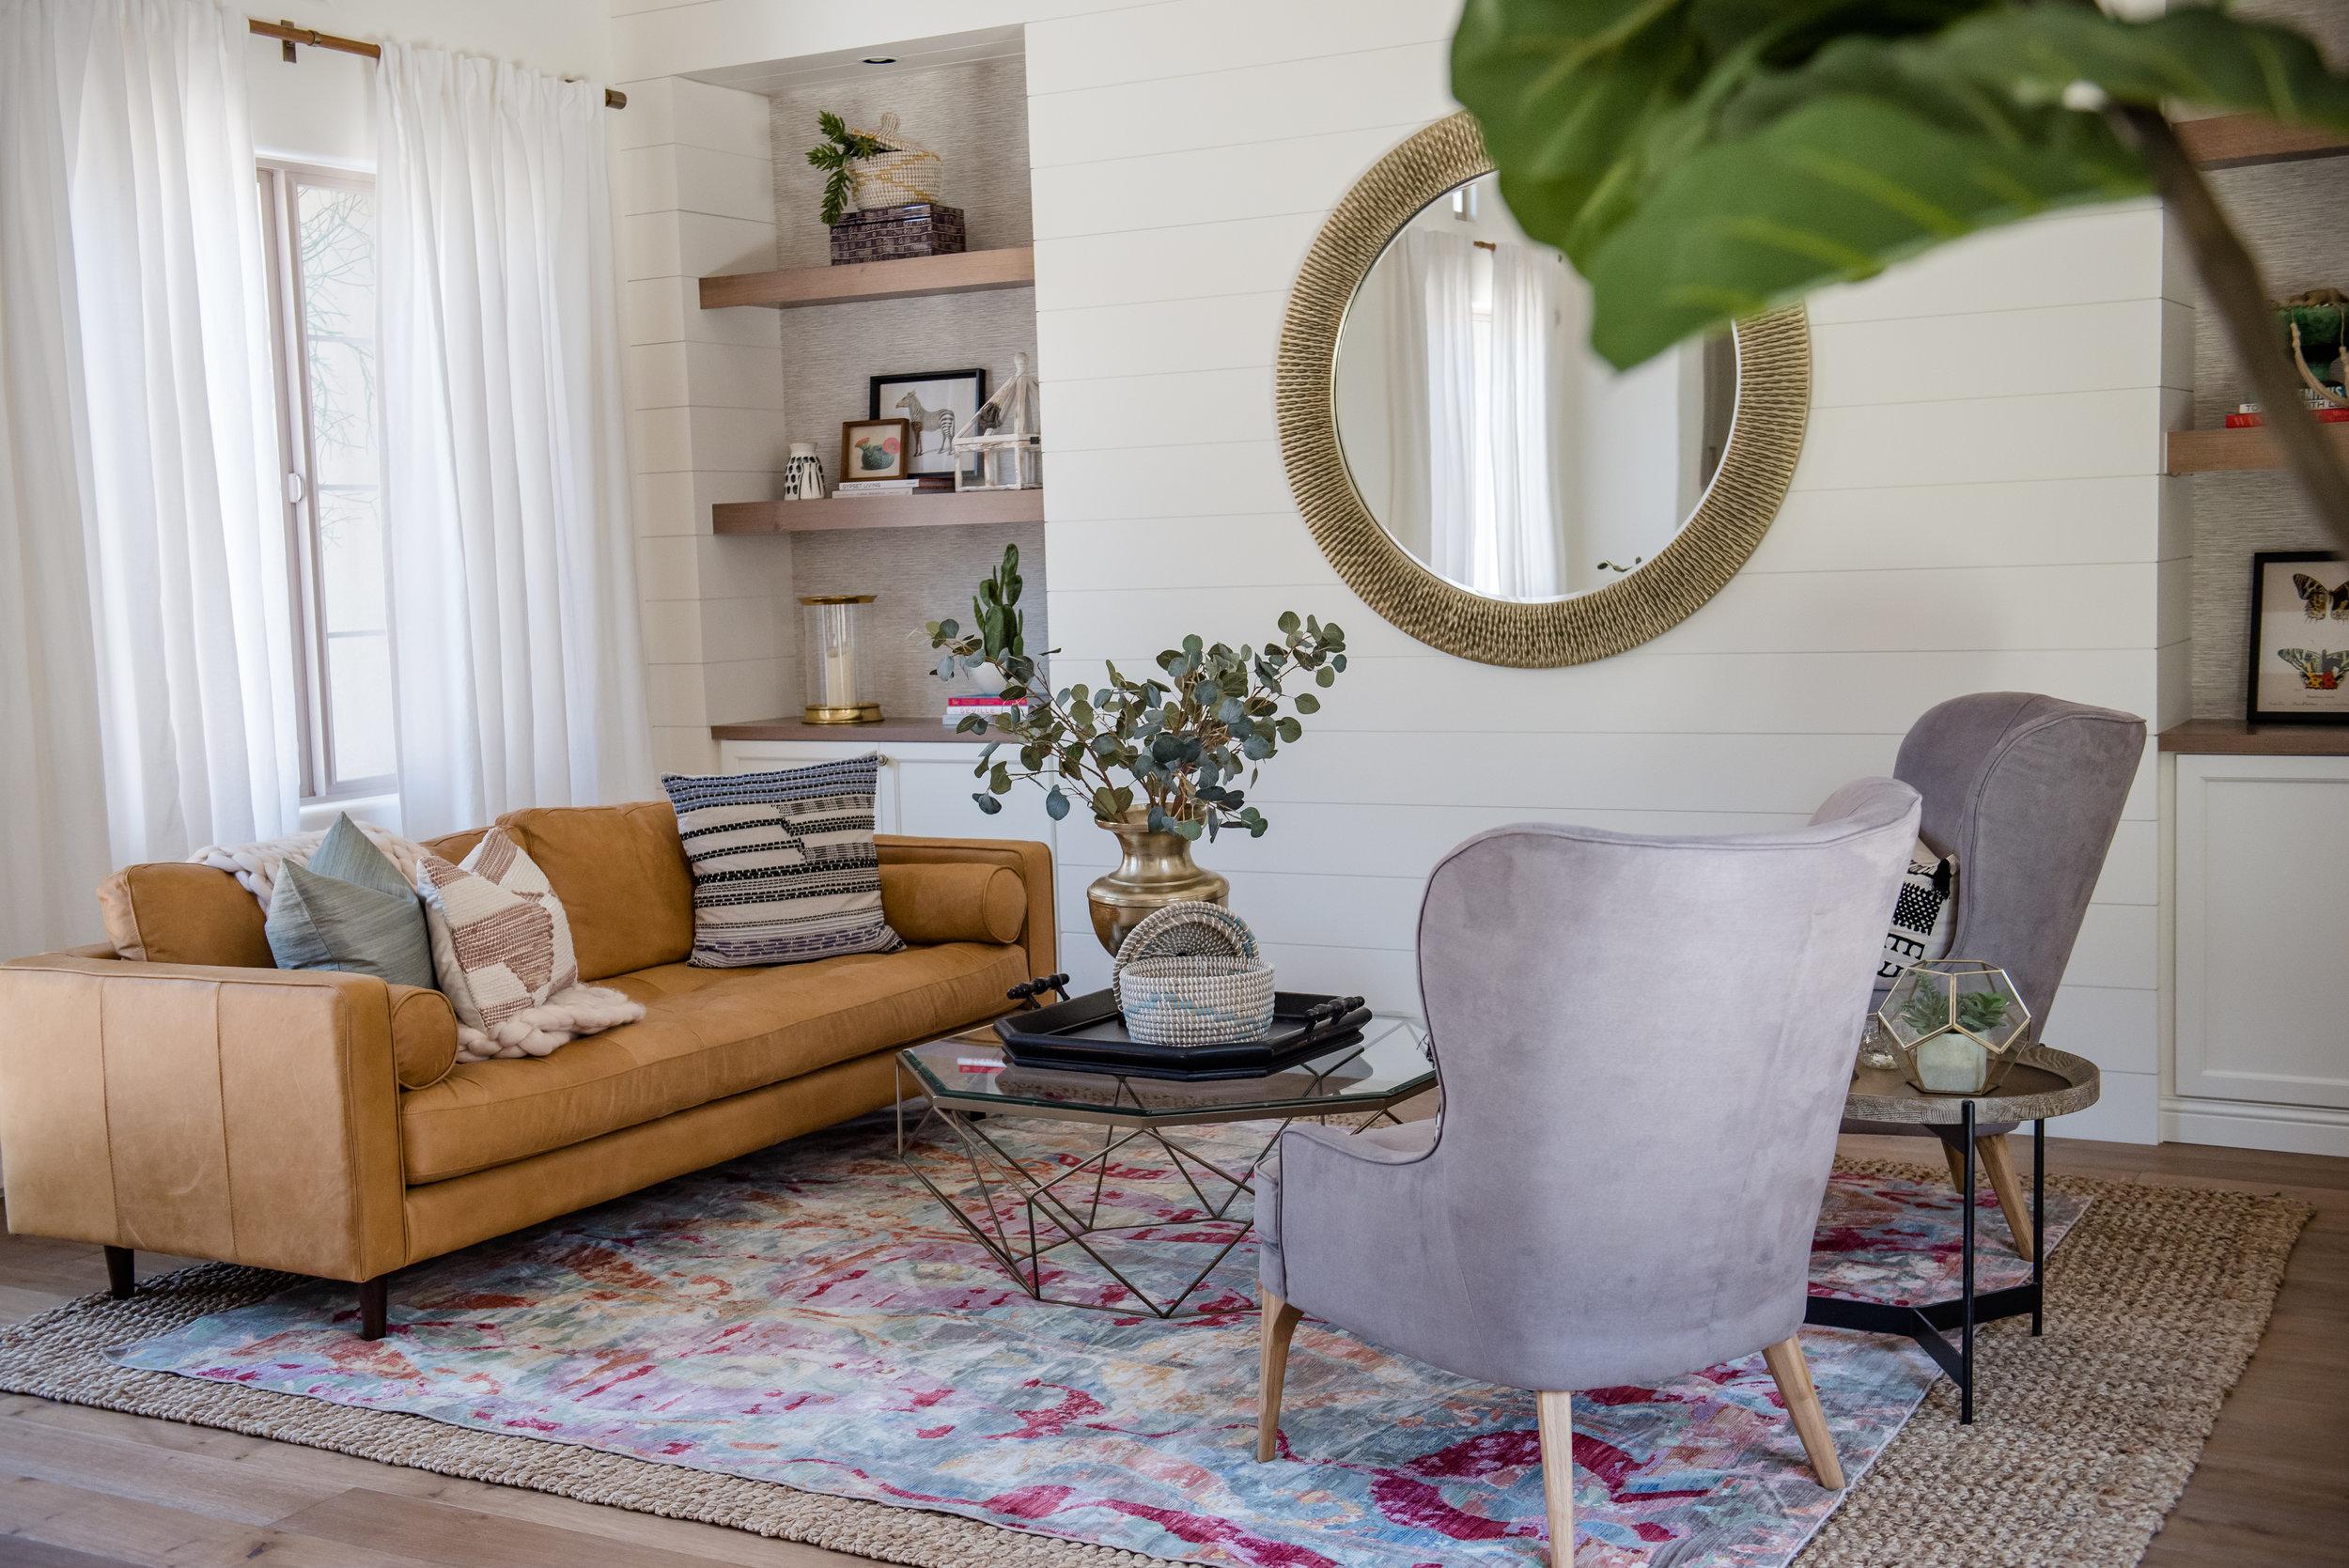 5+LivingRoom+Boldrug+Ikat+Roundmirror+builtins+shiplap+graychairs+Leathersofa.jpg